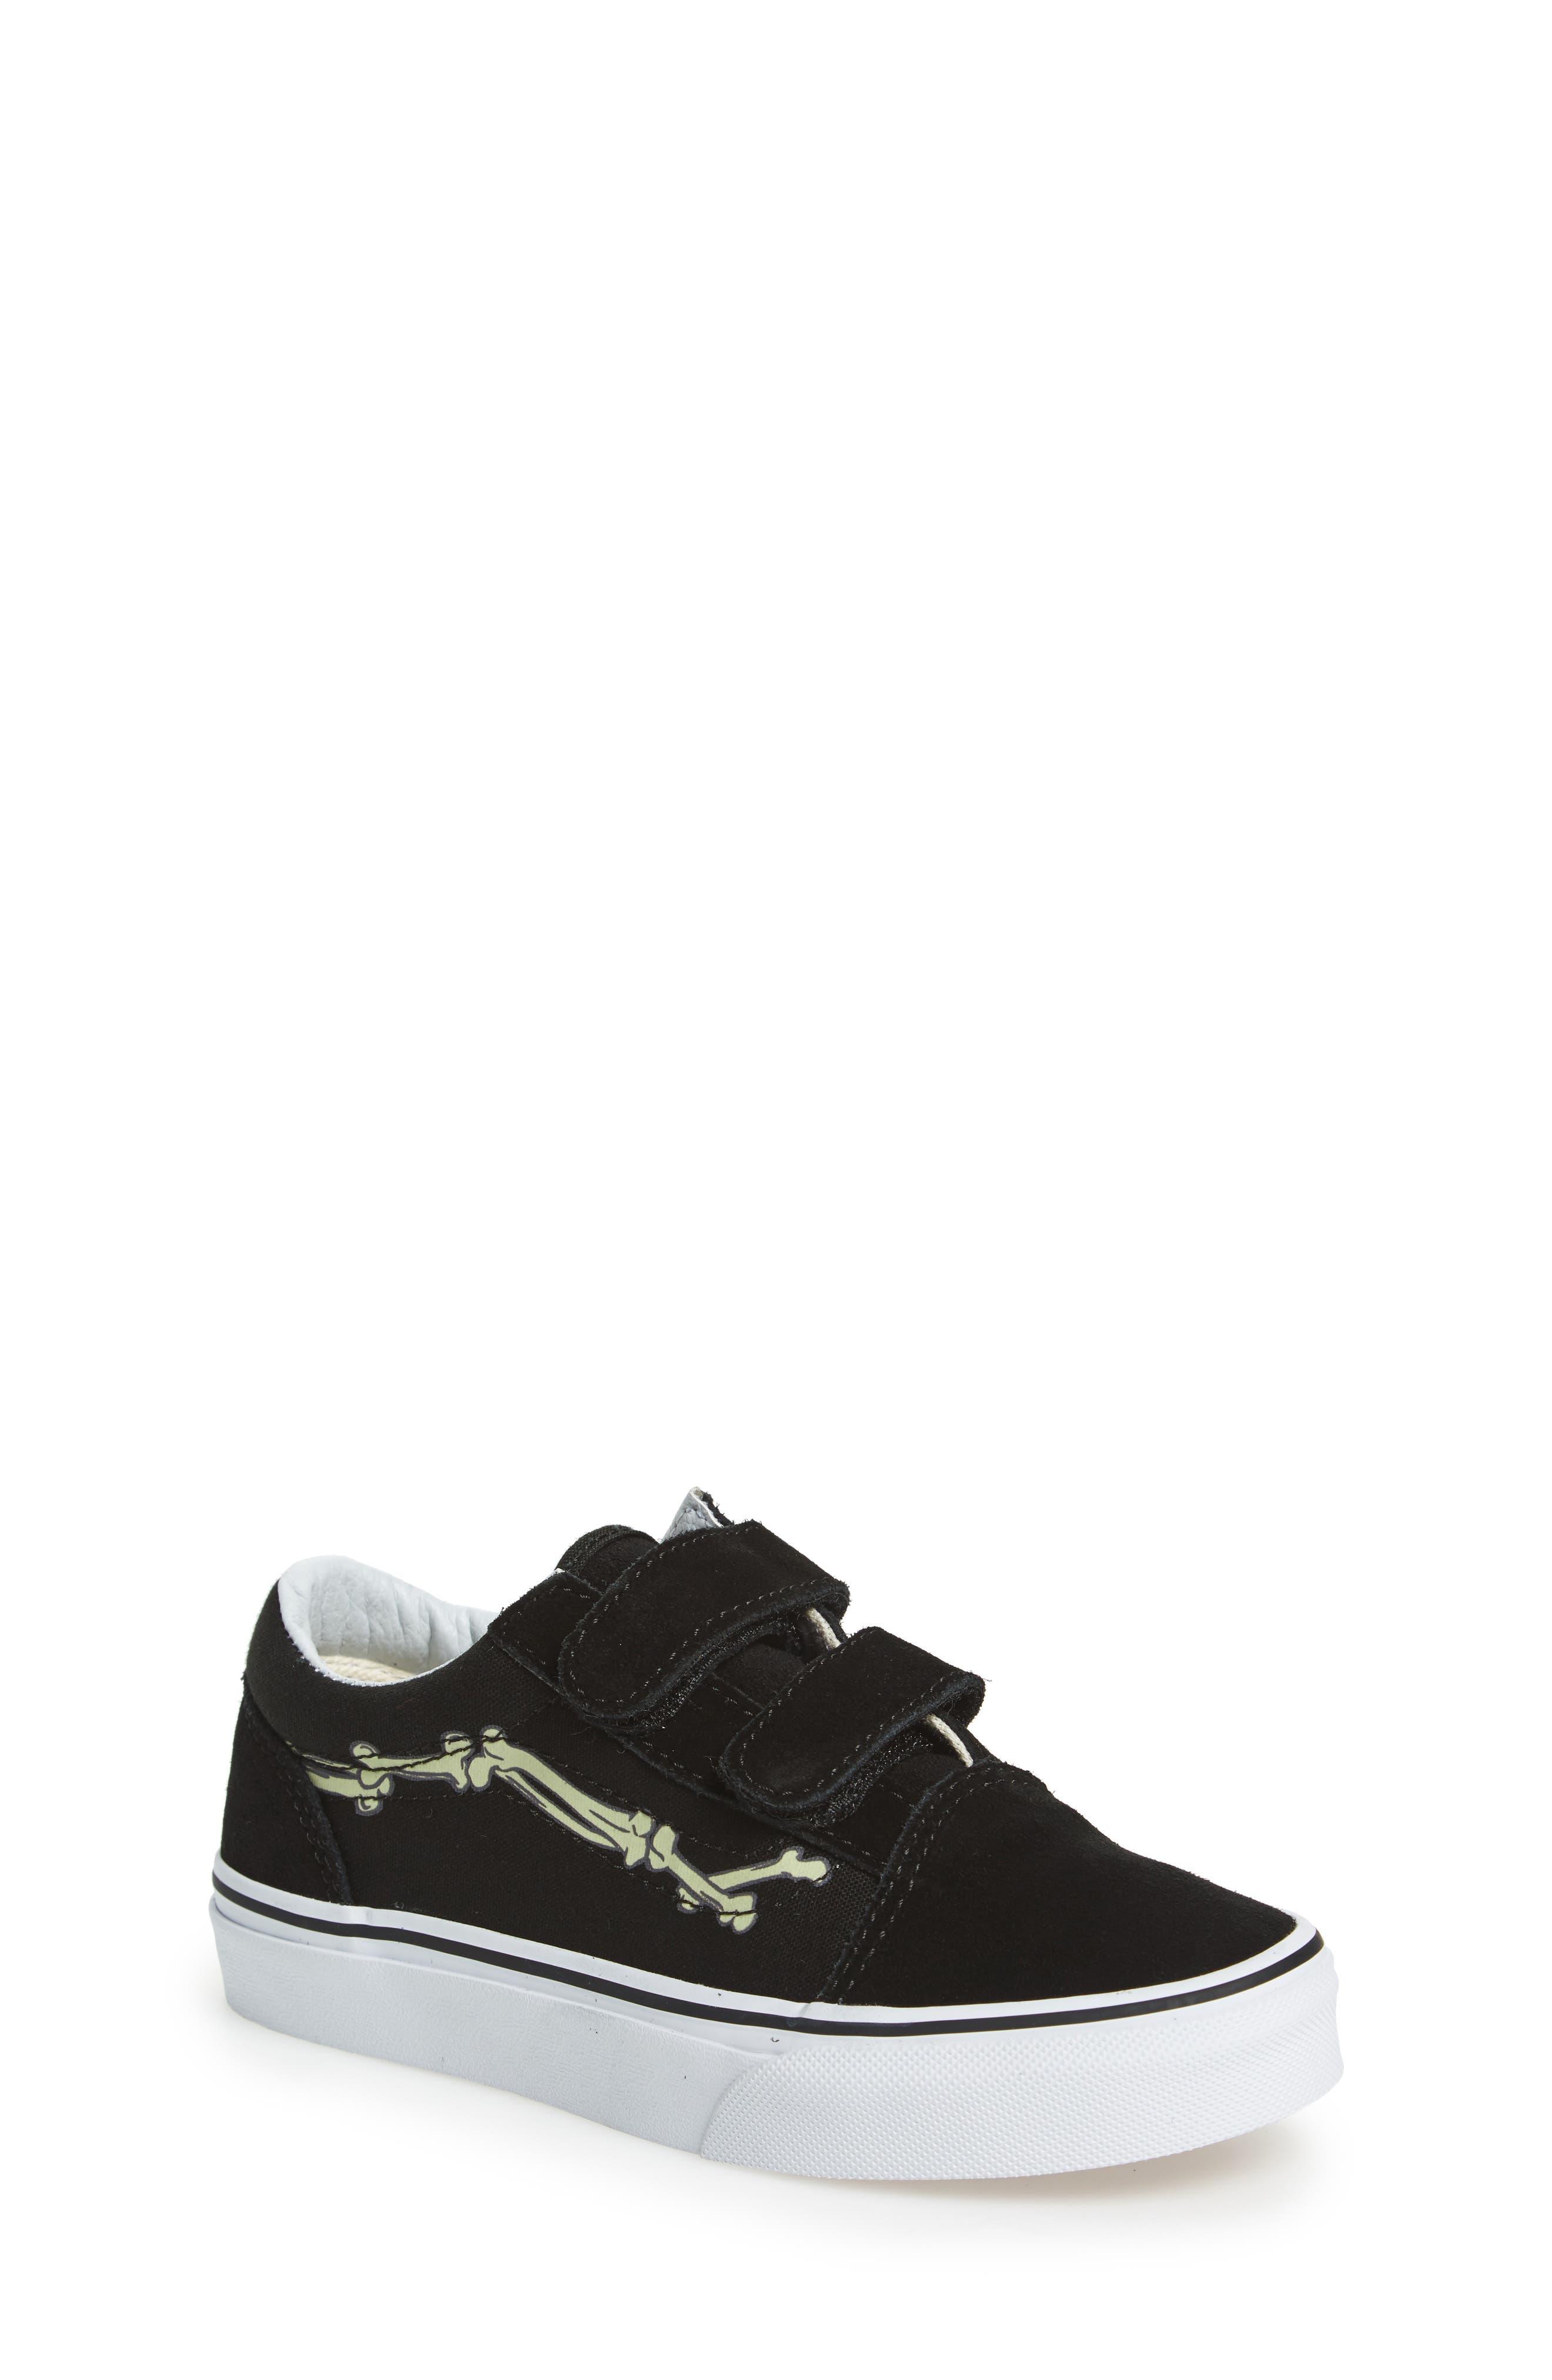 Old Skool Skate Sneaker,                             Main thumbnail 1, color,                             Glow Bones Black/ White